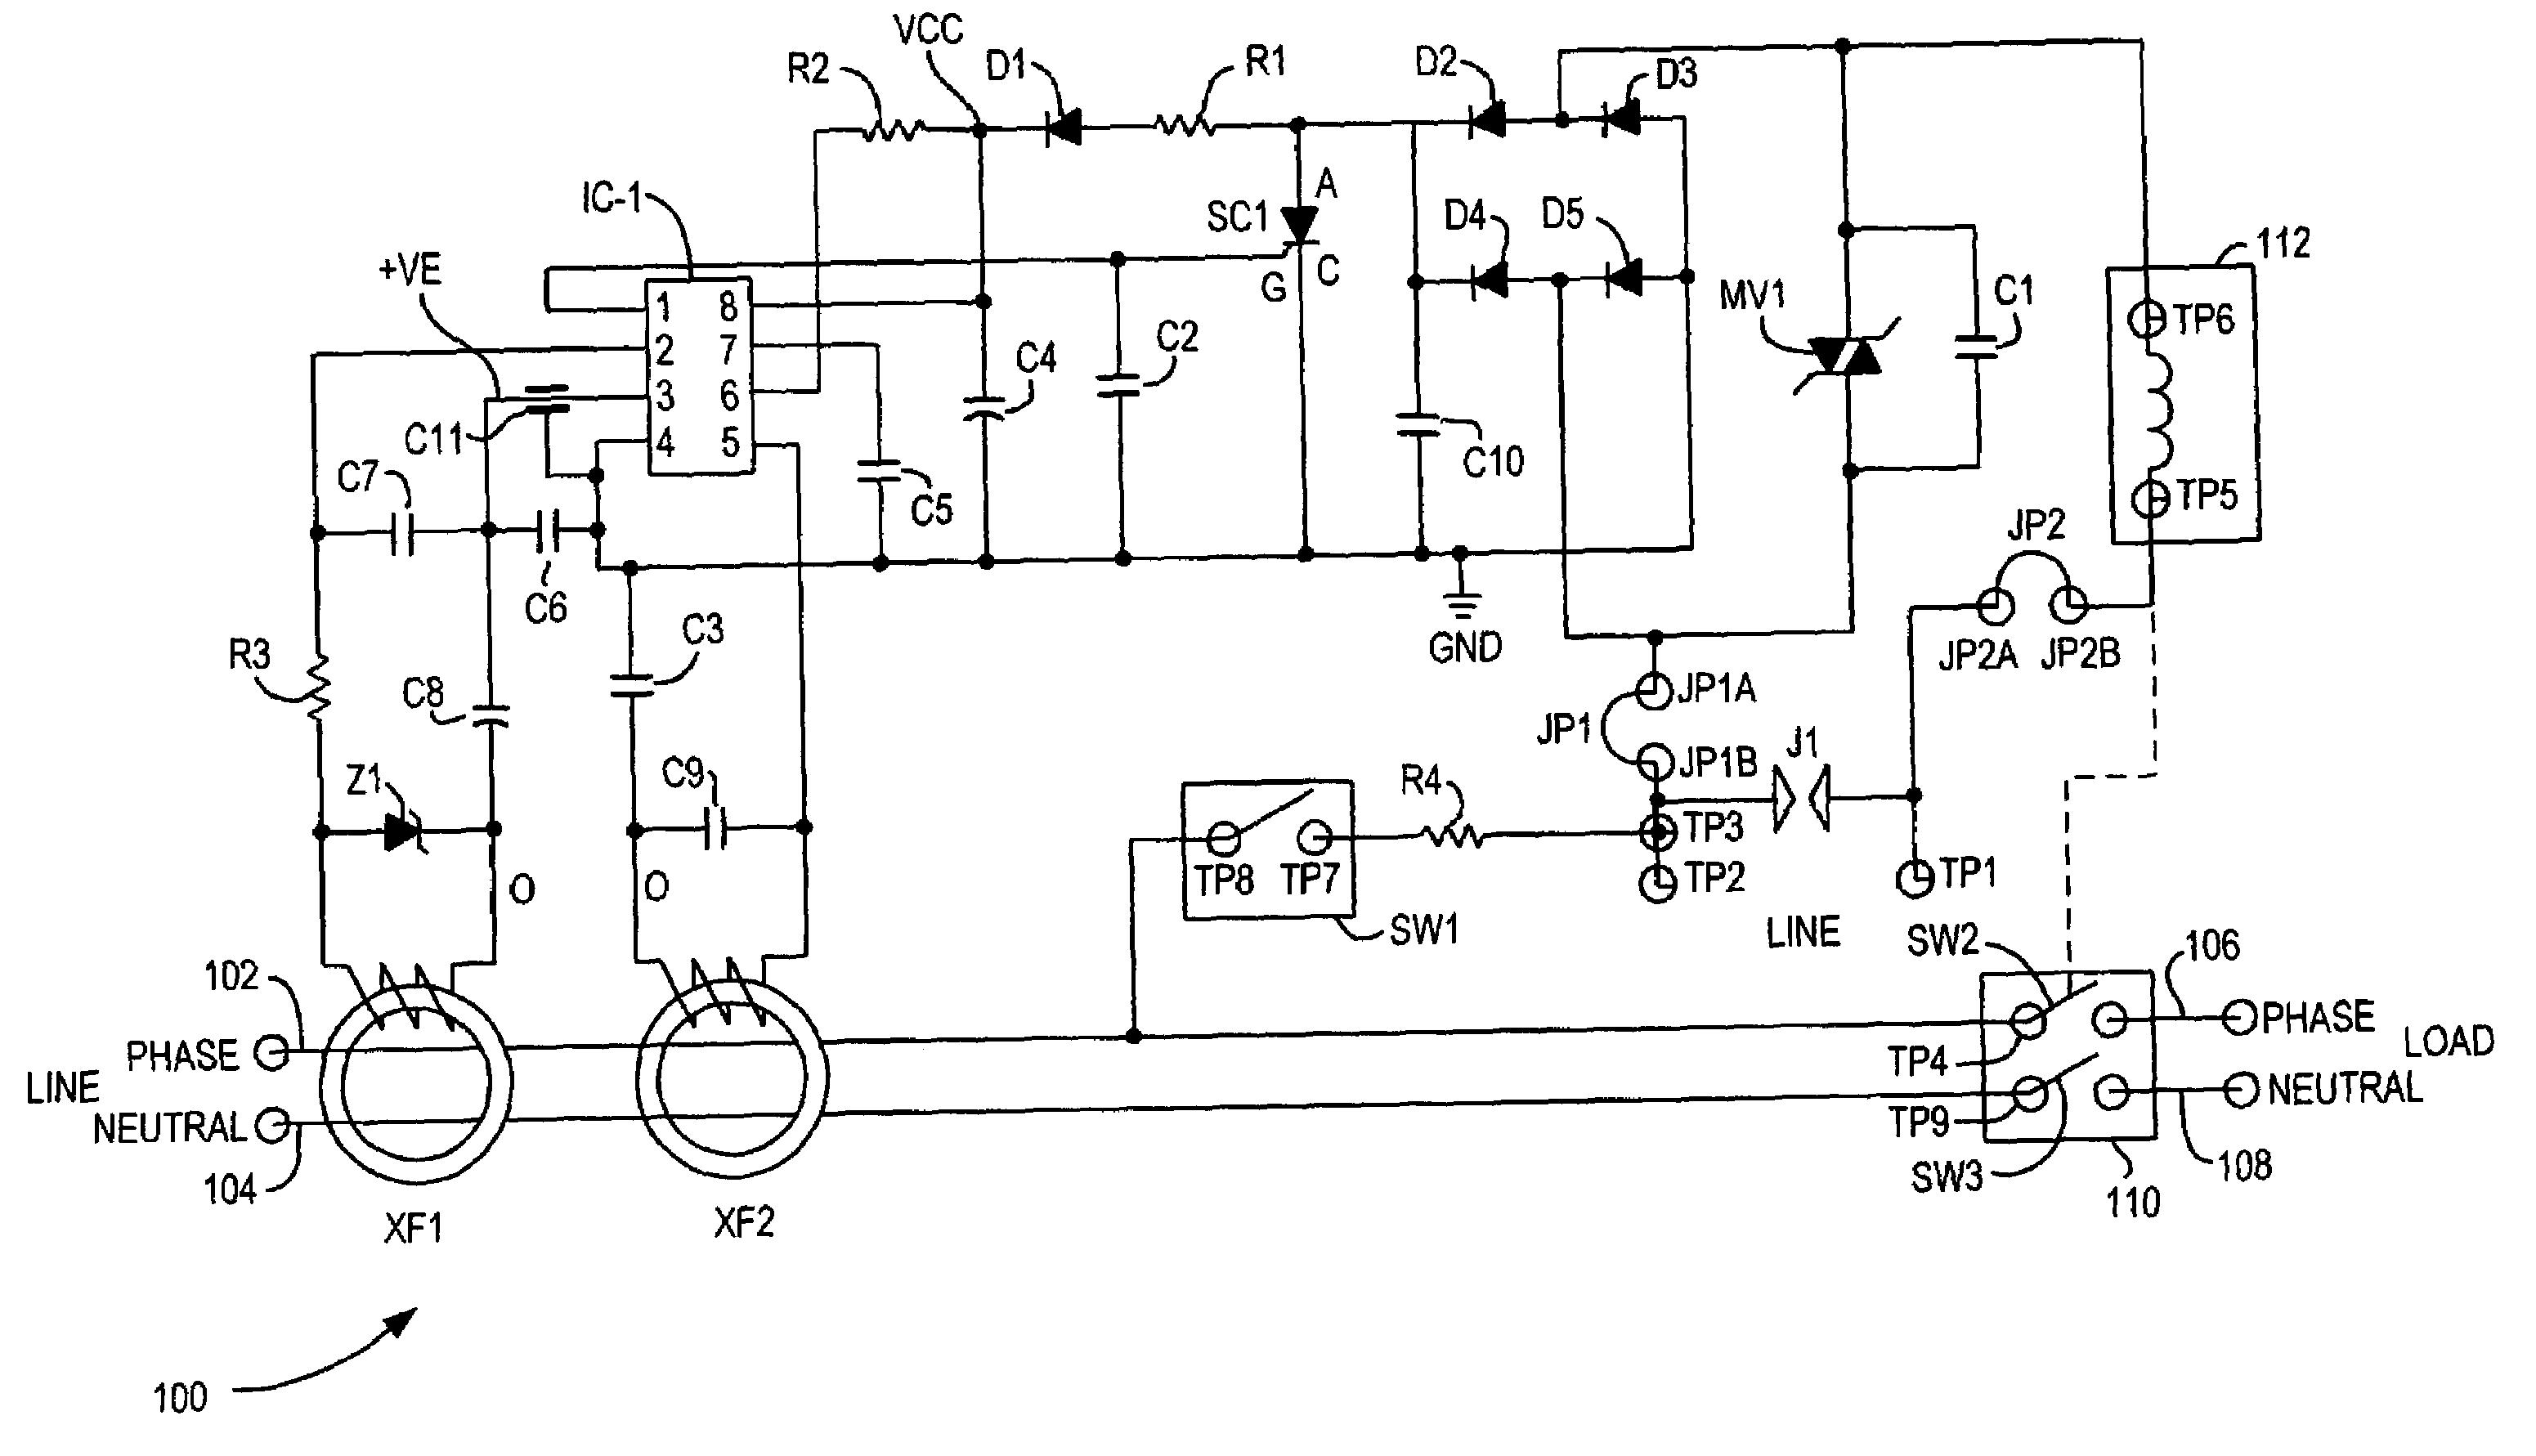 ground fault interrupter circuit